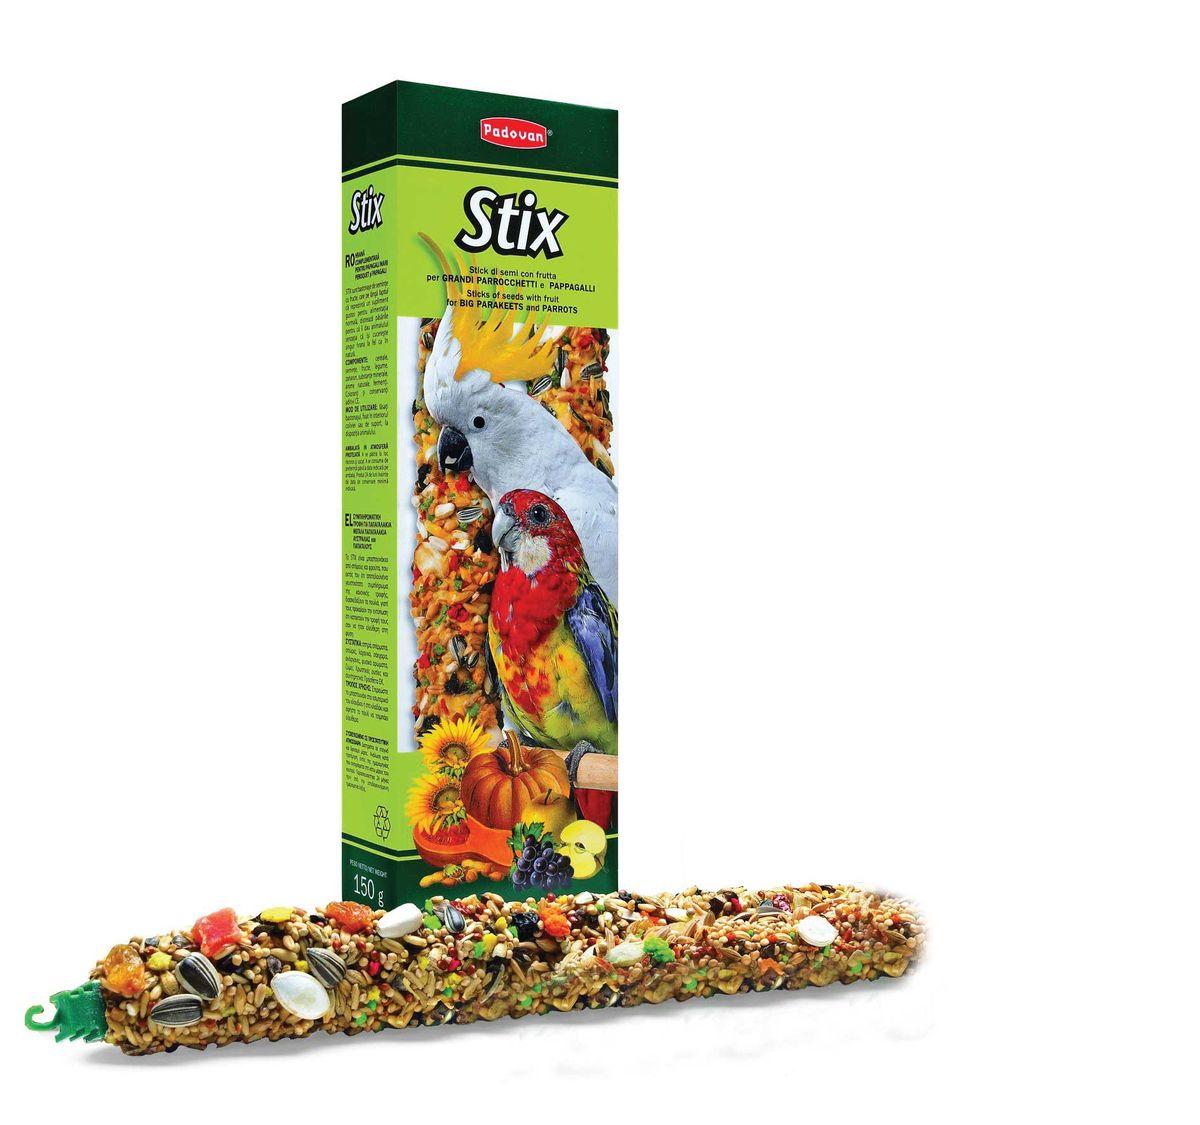 Лакомство Padovan Фруктовые для крупных и средних попугаев, палочки, 2 шт х 150 г padovan корм padovan lino для птиц зёрна льна 1 кг